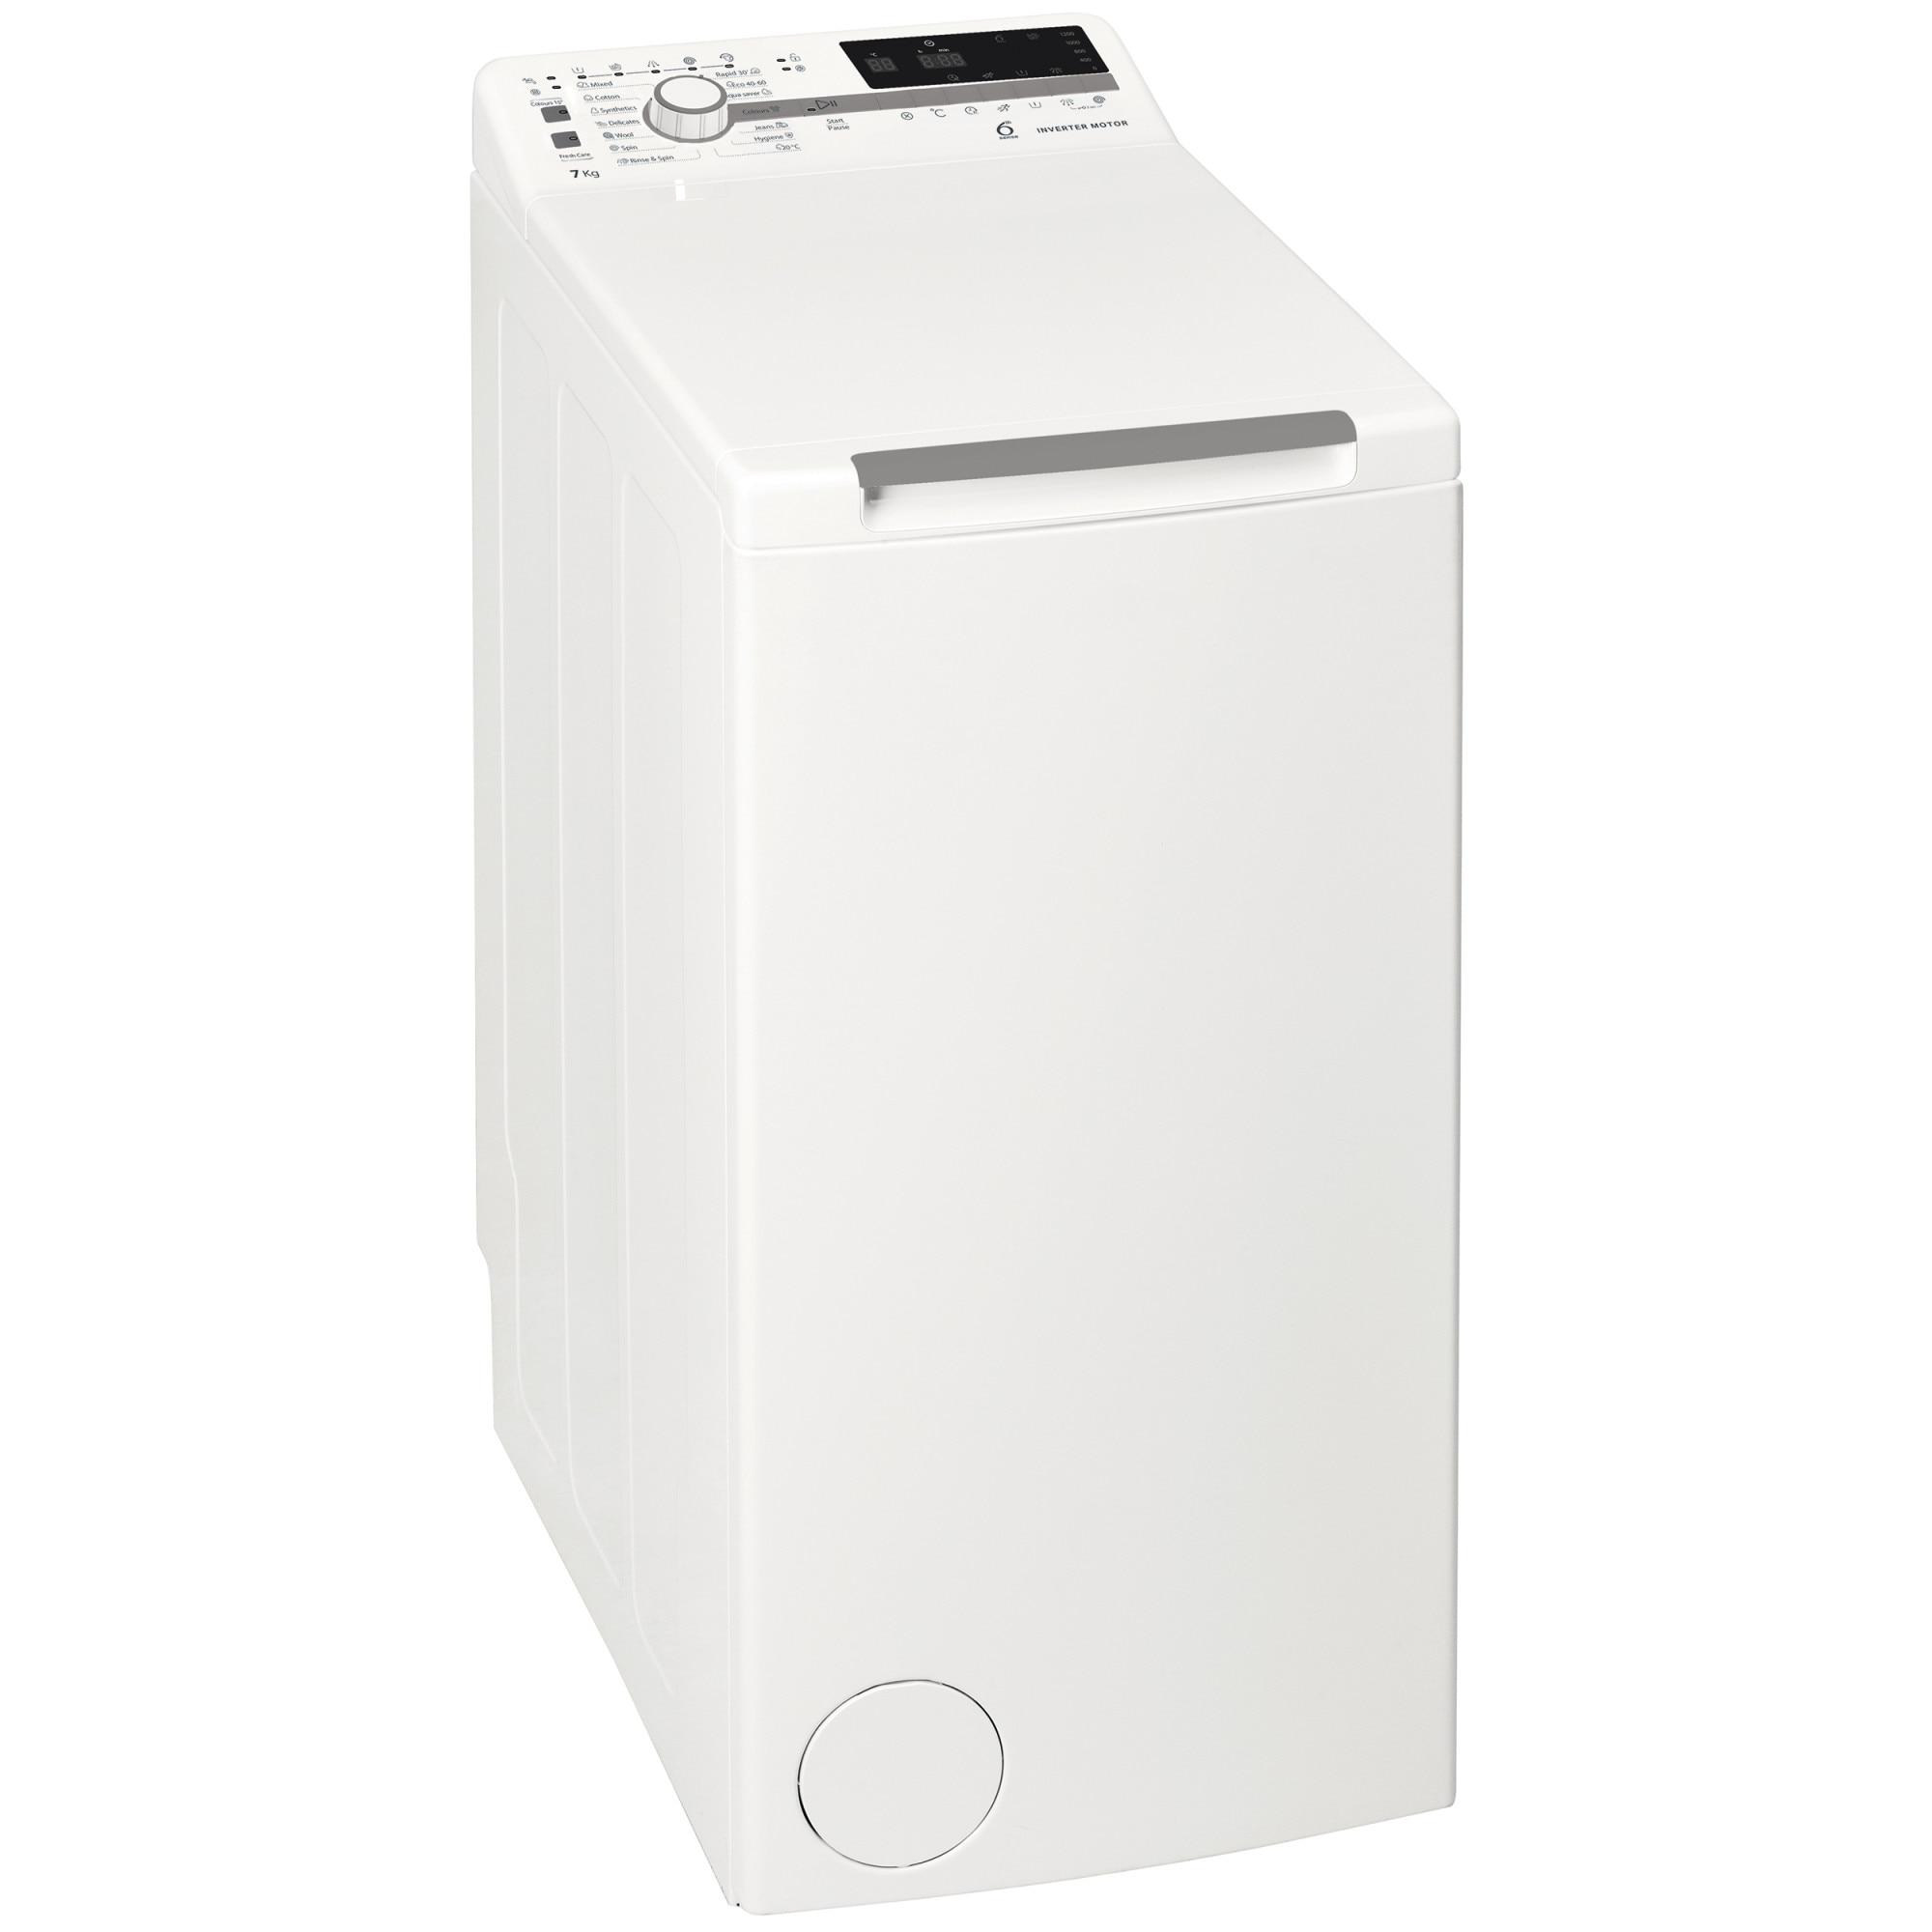 Fotografie Masina de spalat rufe cu incarcare verticala Whirlpool TDLR7221BSEUN, 7 kg, 1200 RPM, Clasa A+++, Tehnologia al 6-lea simt, Motor Inverter, Display digital, Alb